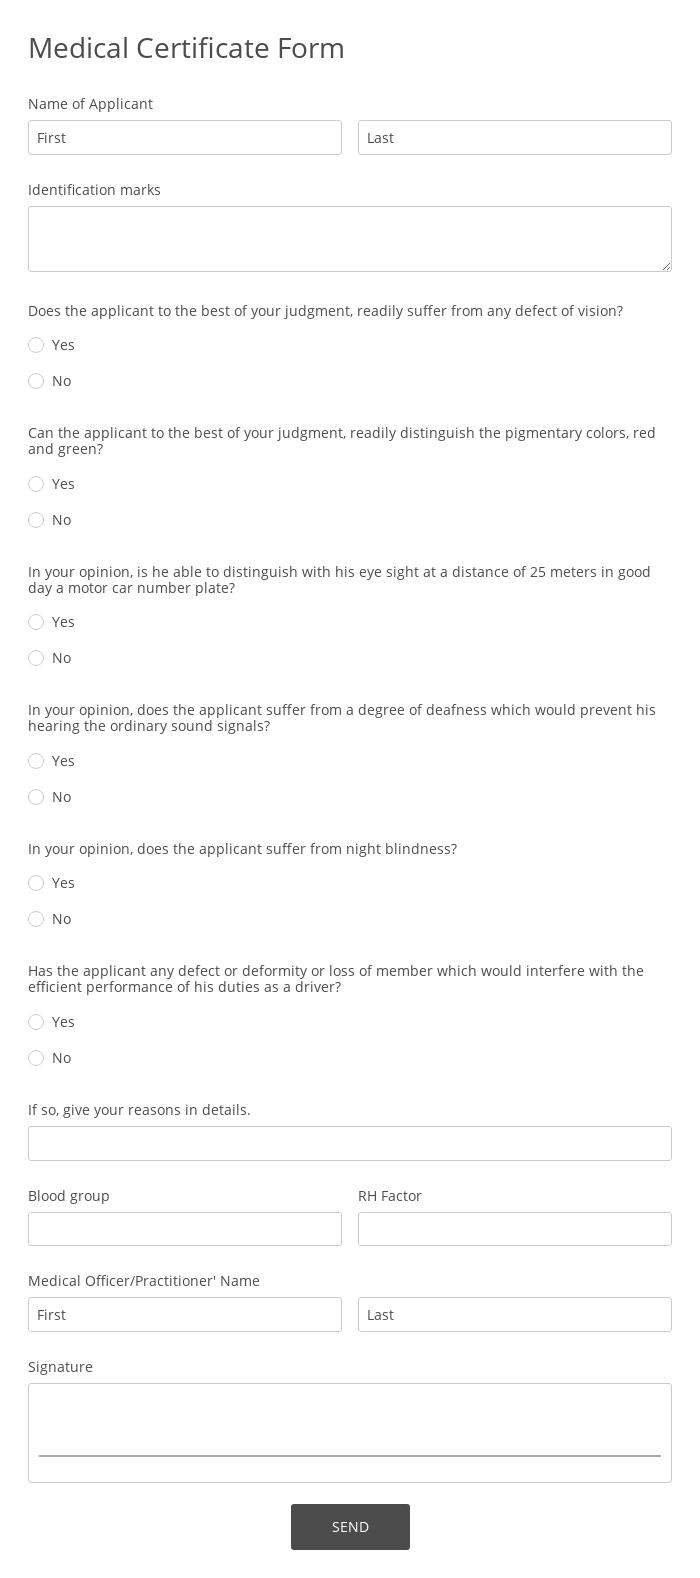 Medical Certificate Form